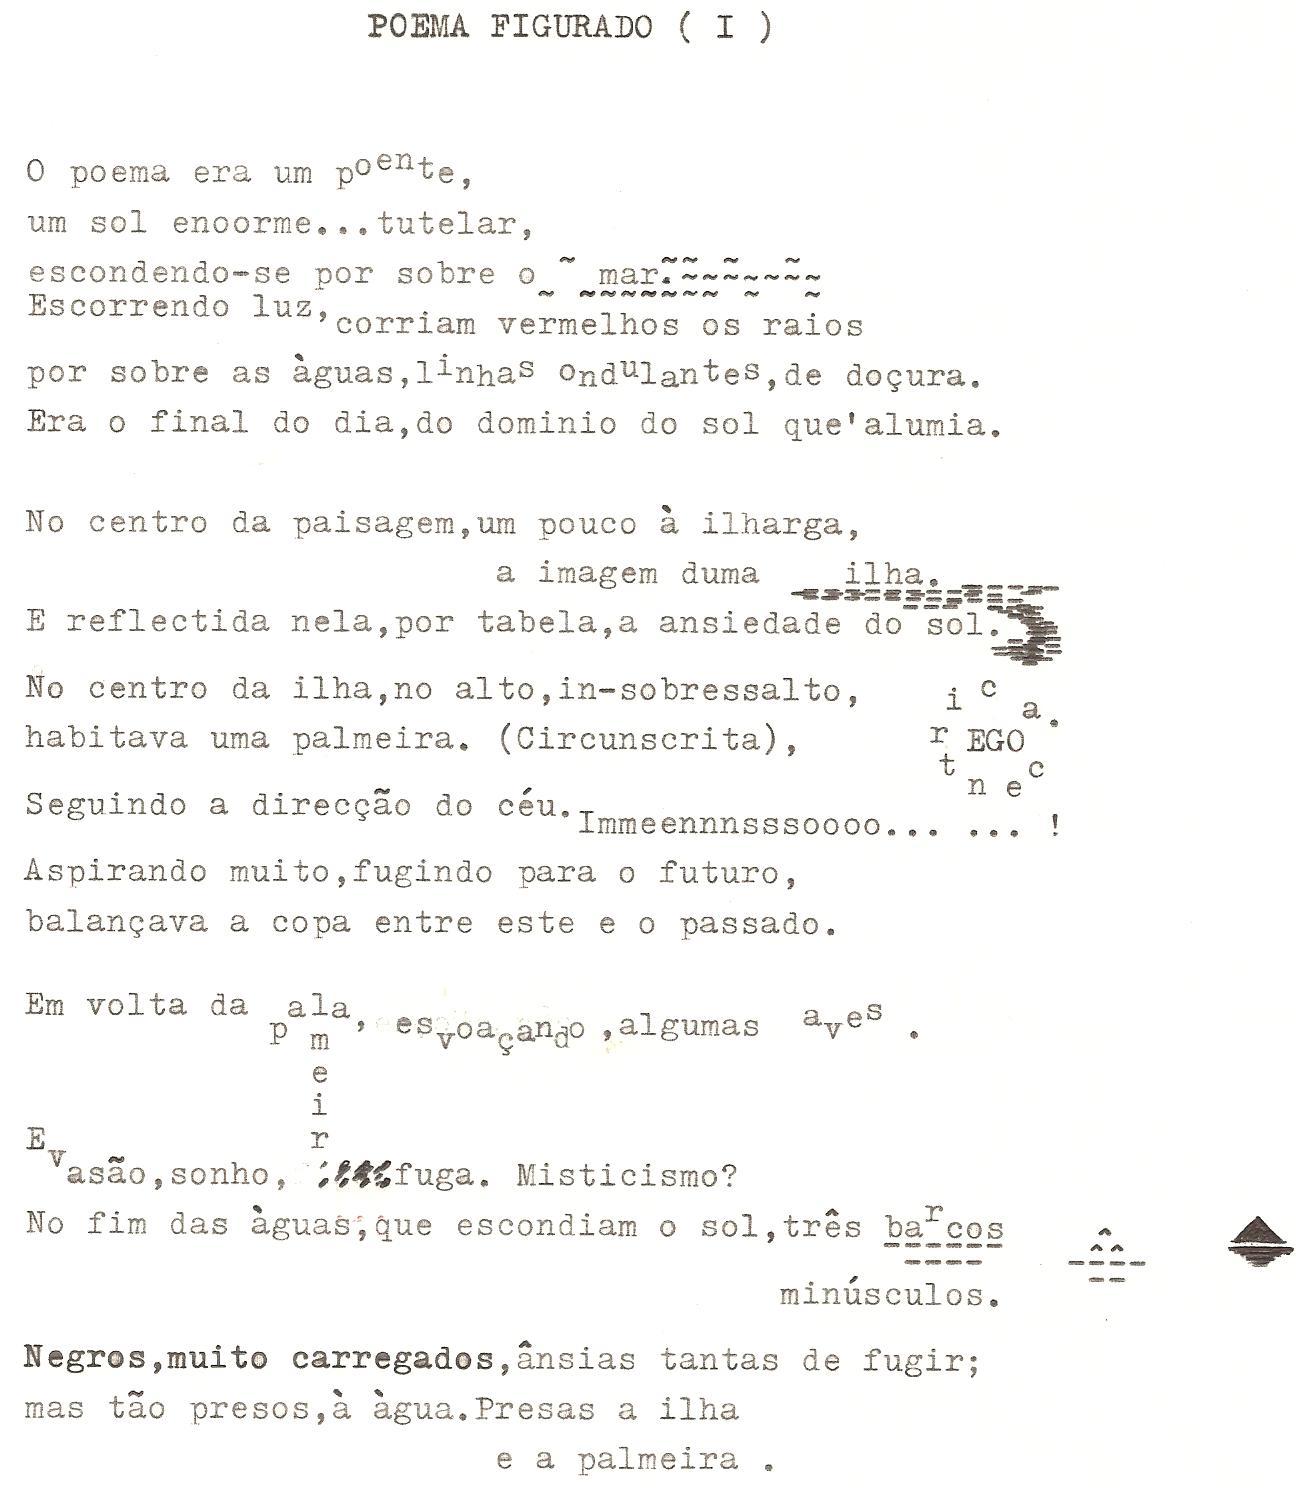 Poema Figurado I  1987.jpg